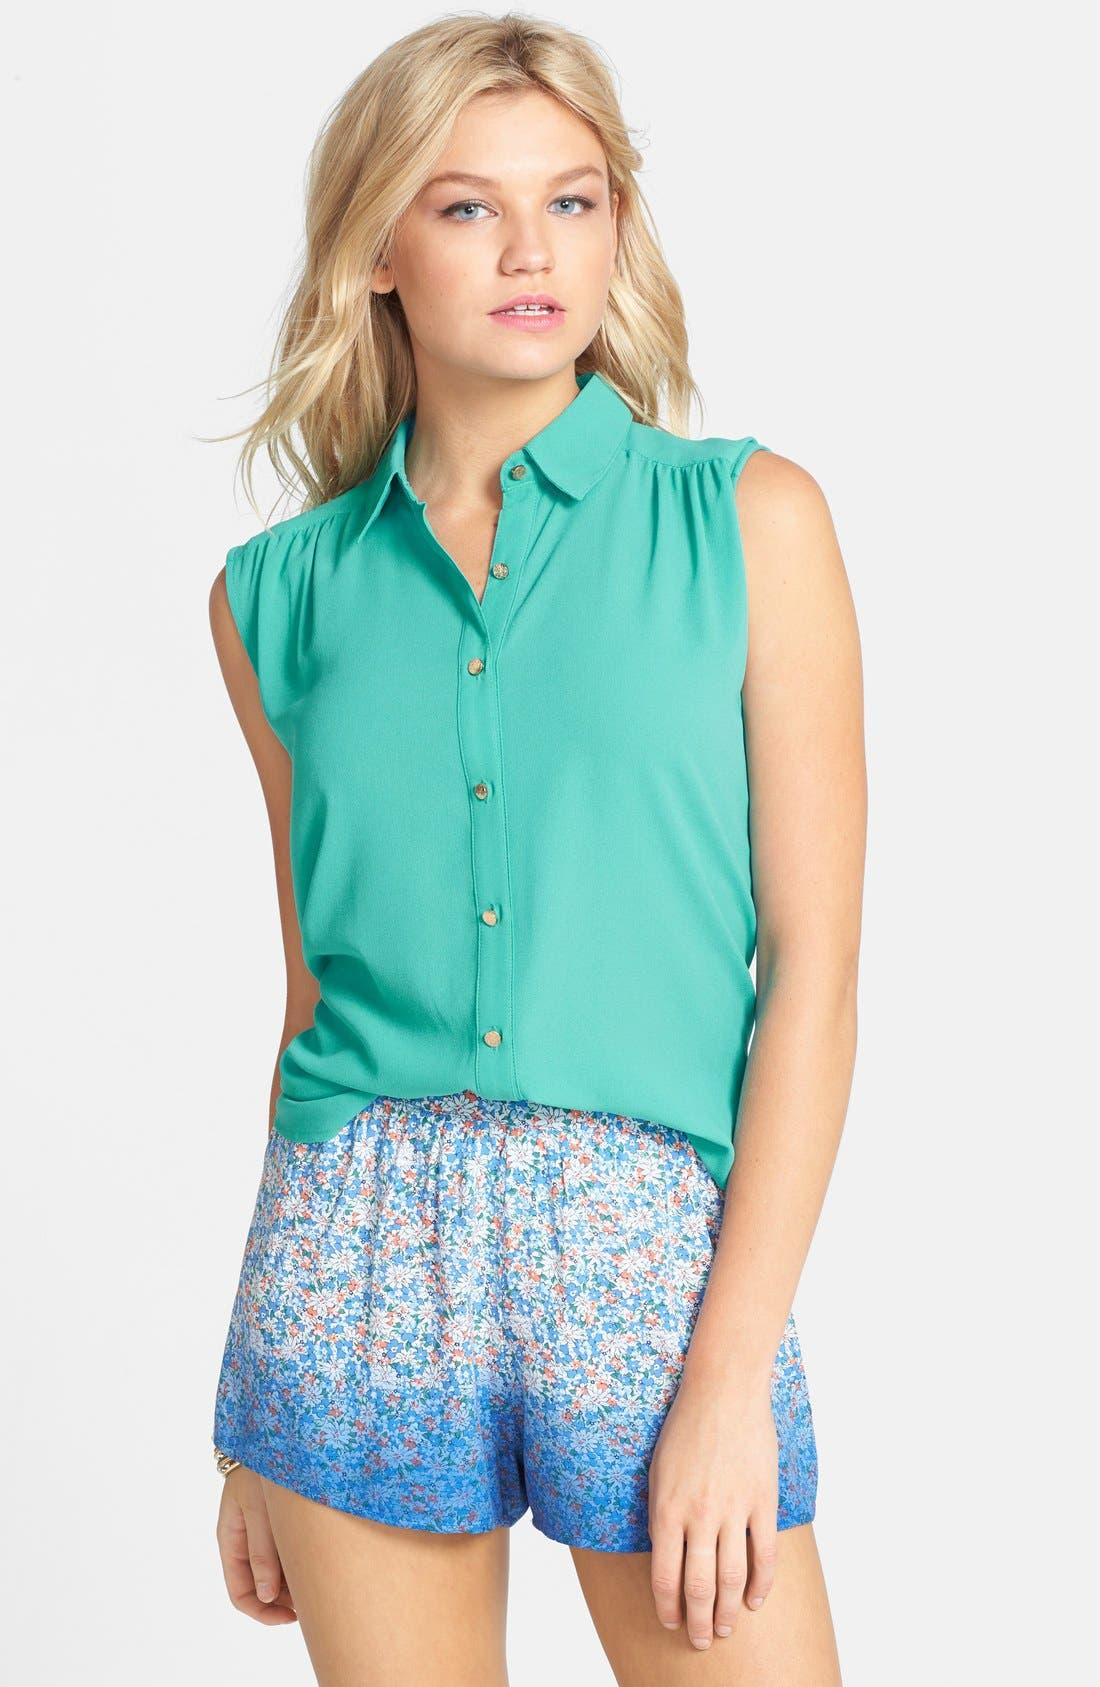 Alternate Image 1 Selected - Lush Cutout Sleeveless Shirt (Juniors)